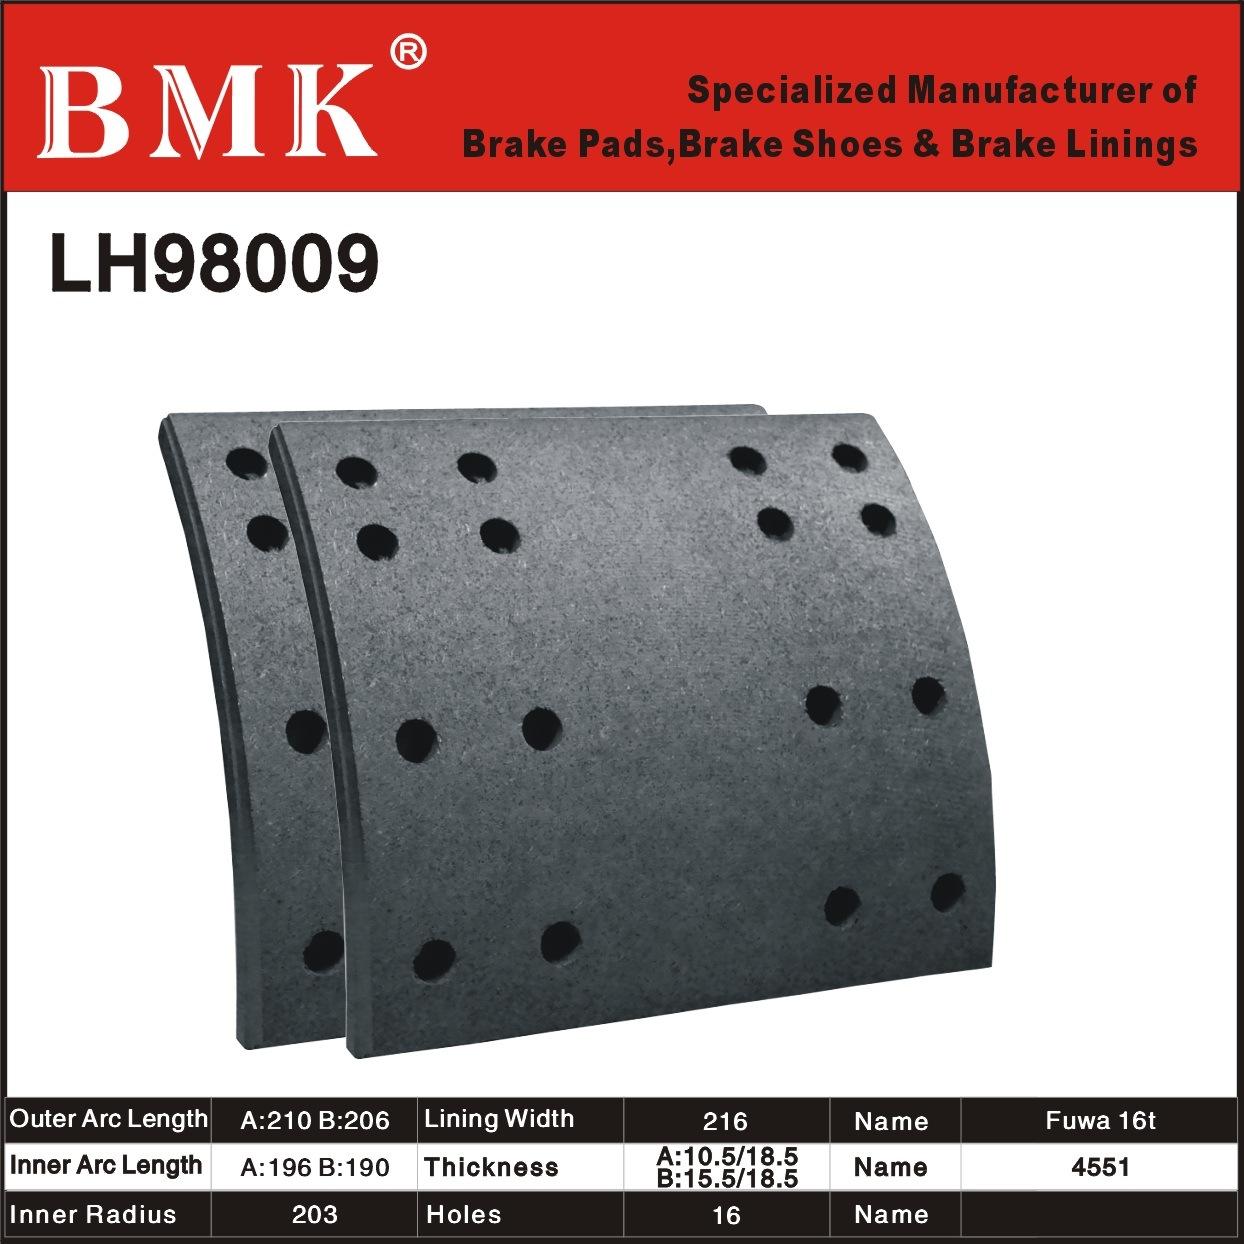 Premium Quality Brake Linings (LH98009)